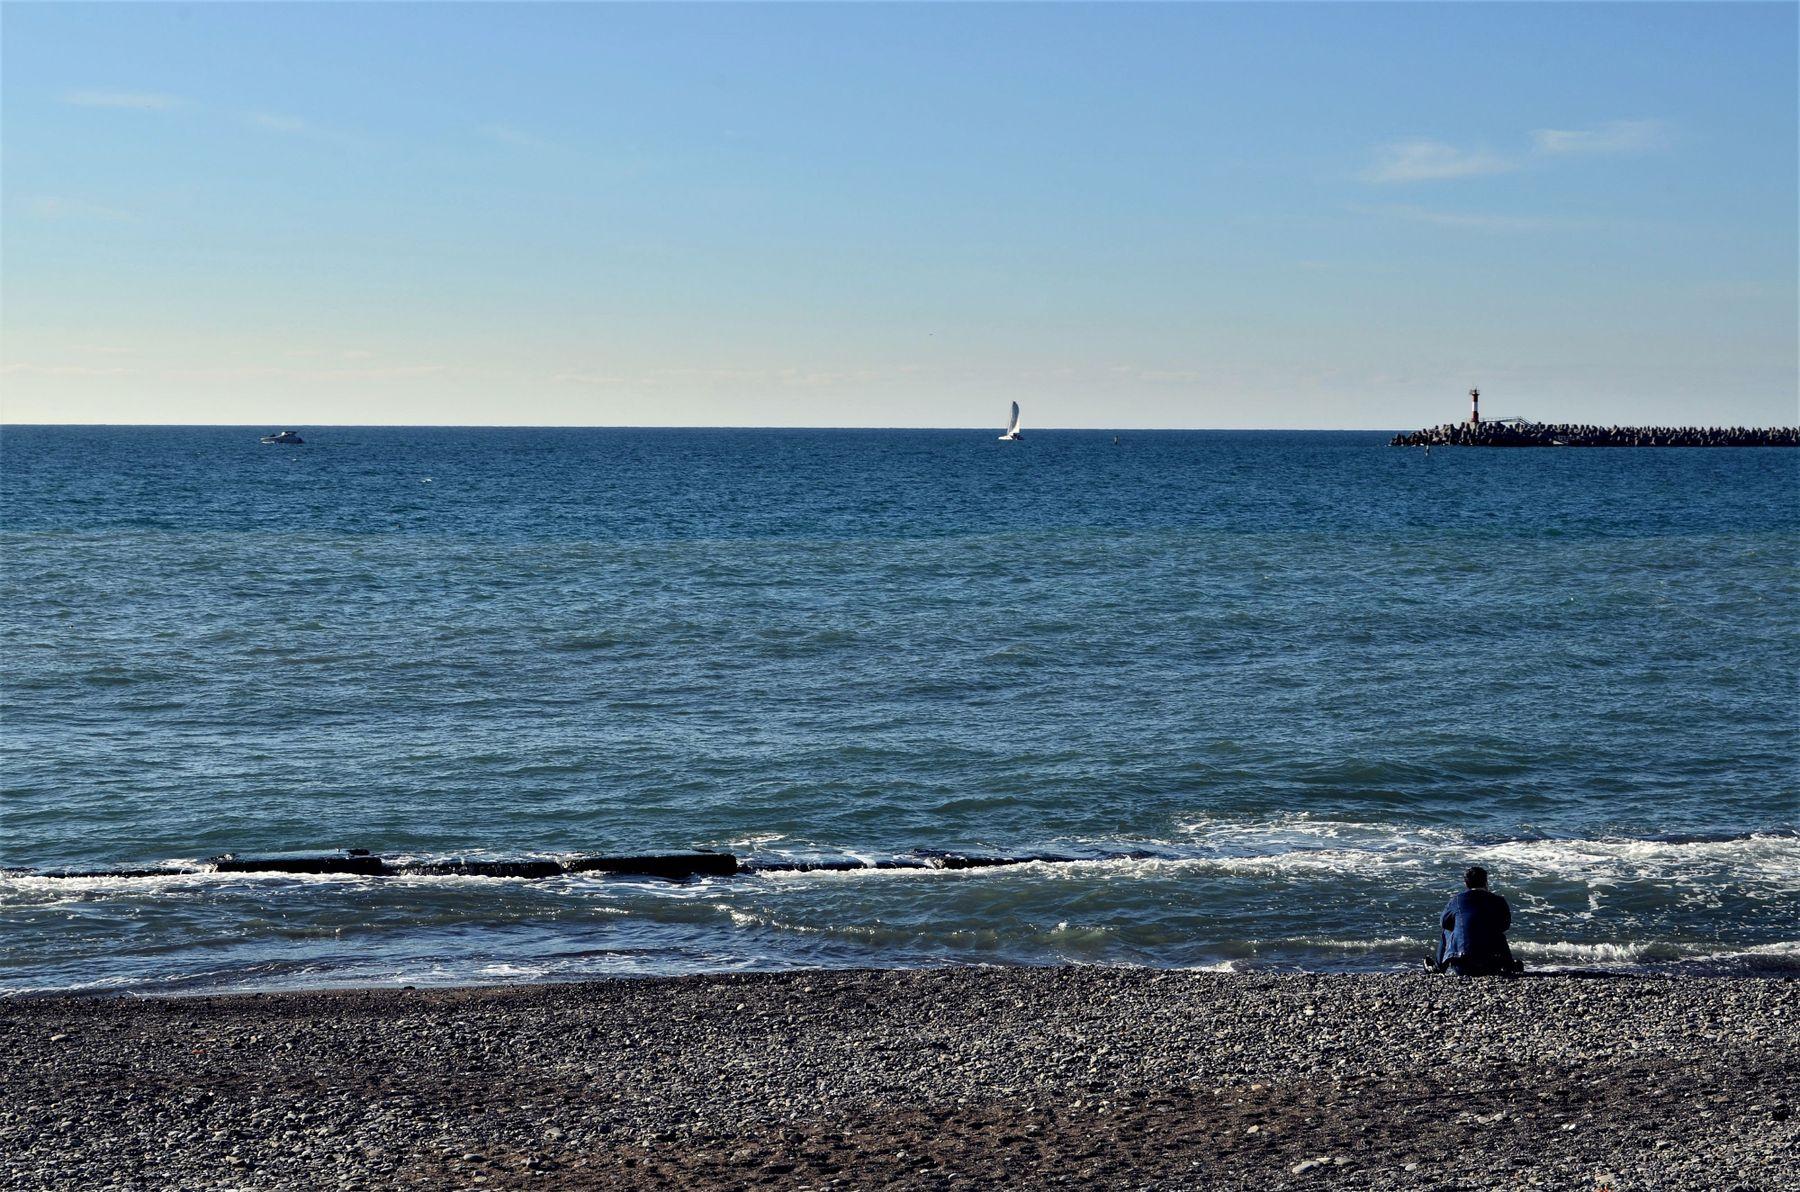 Человек и море.... море Сочи декабрь 2020 небо берег красота путешествие